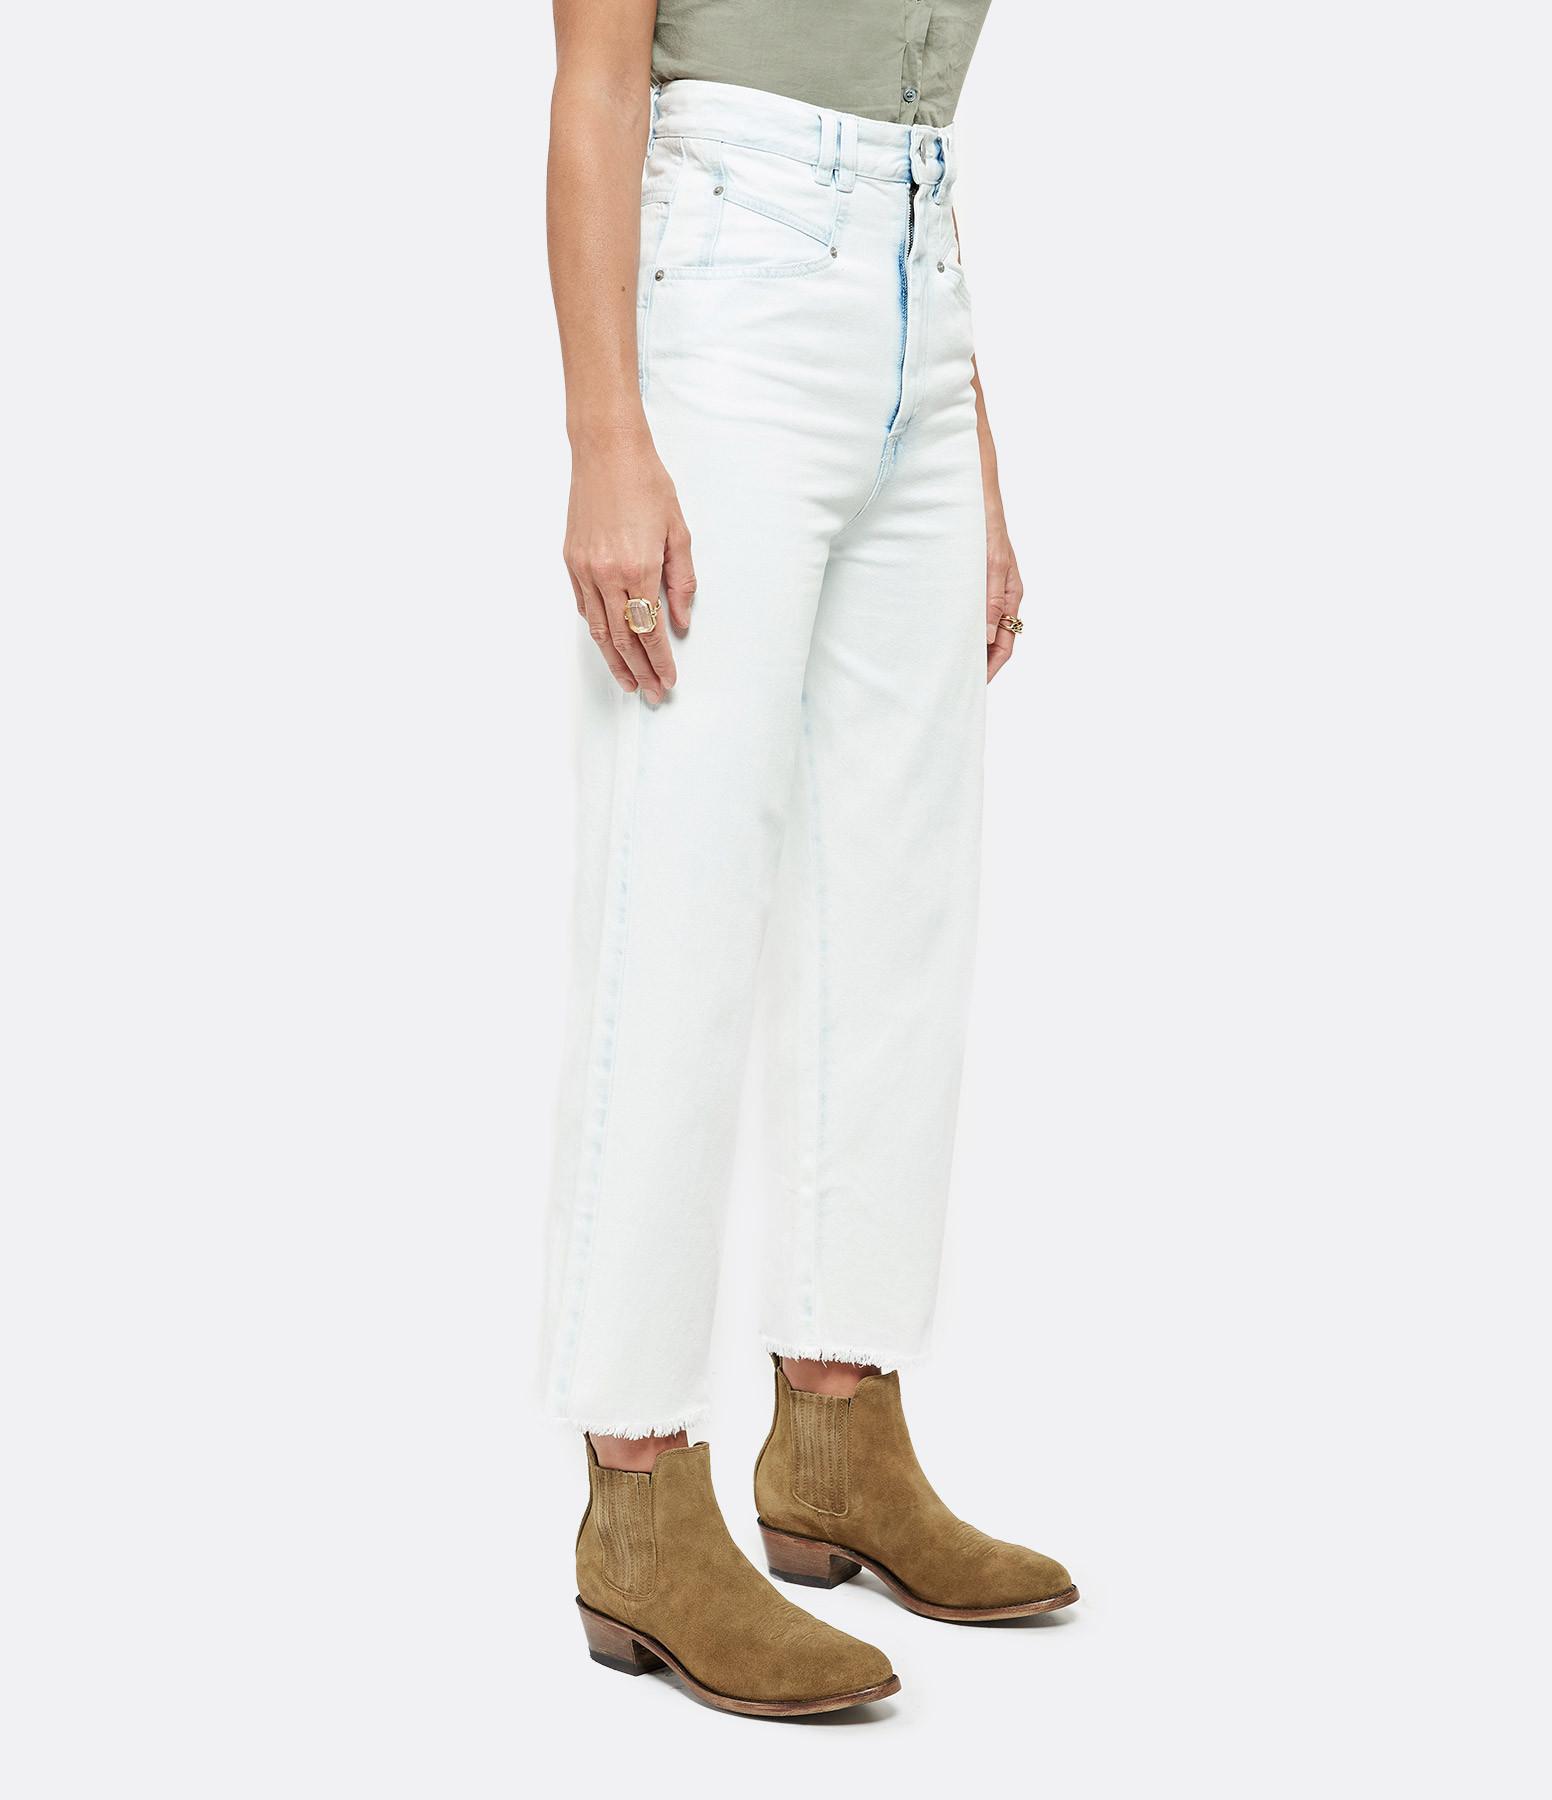 ISABEL MARANT - Pantalon Naliska Coton Bleu Clair